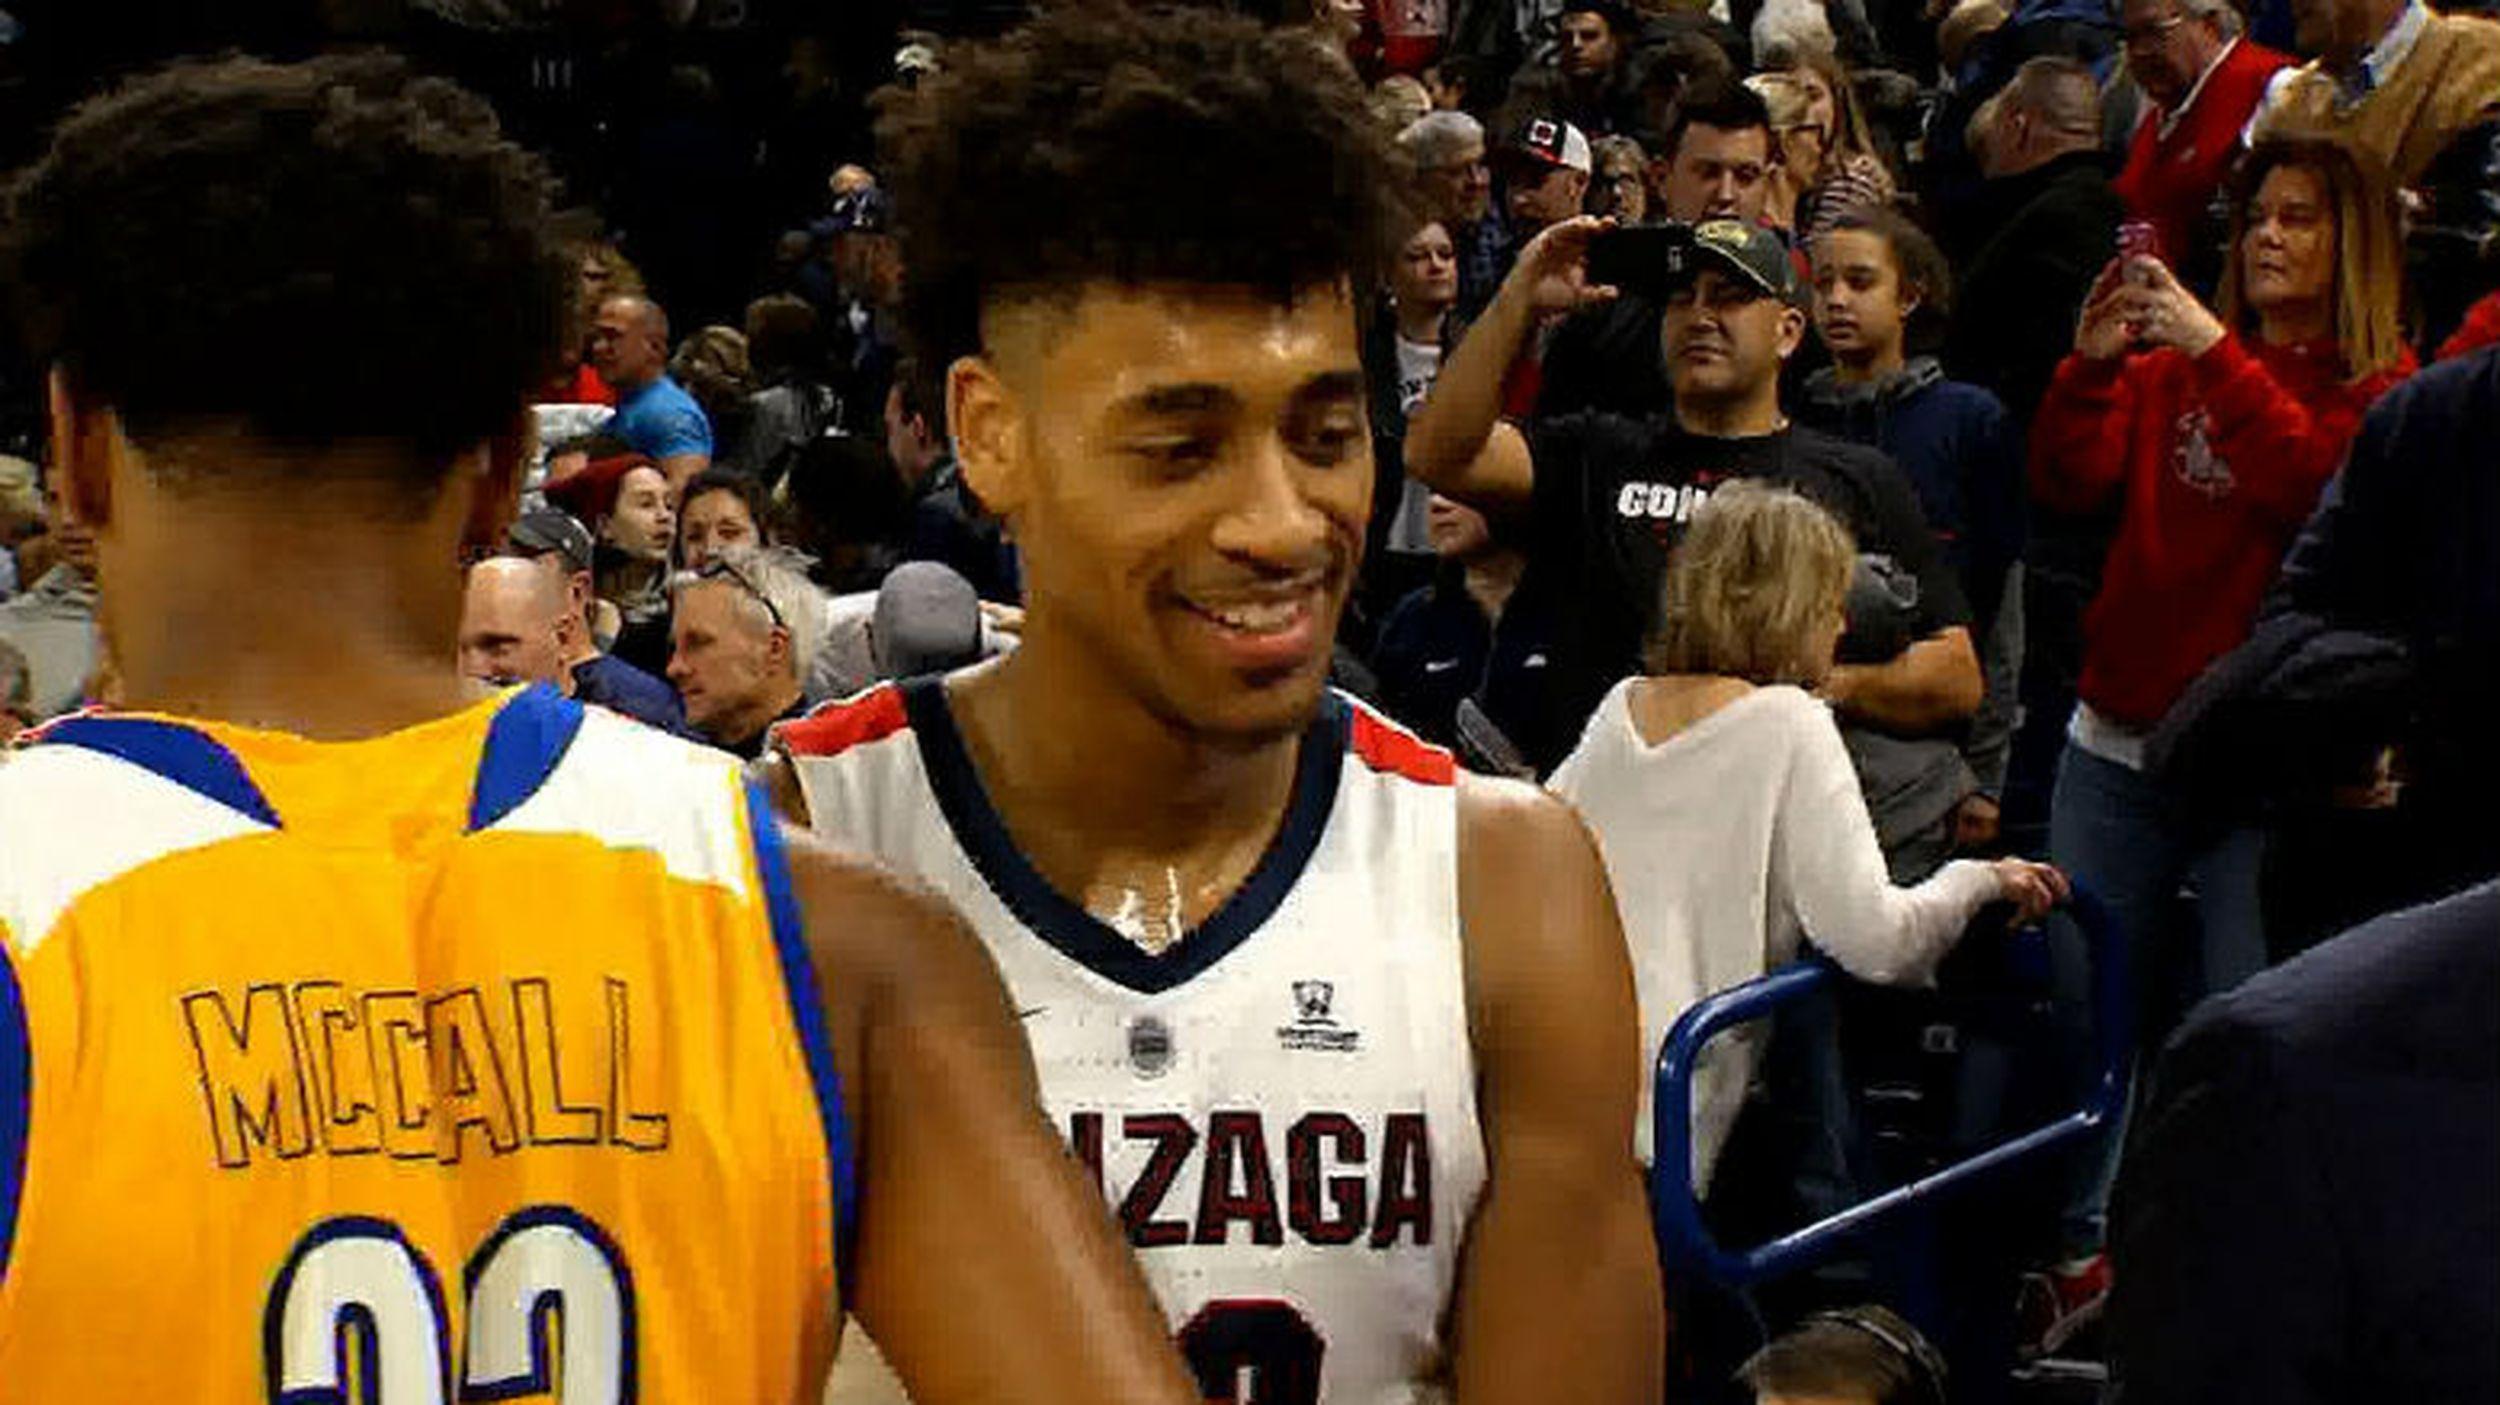 VIDEO: Jeremy Jones proving to be valuable asset for Gonzaga - Jan ...